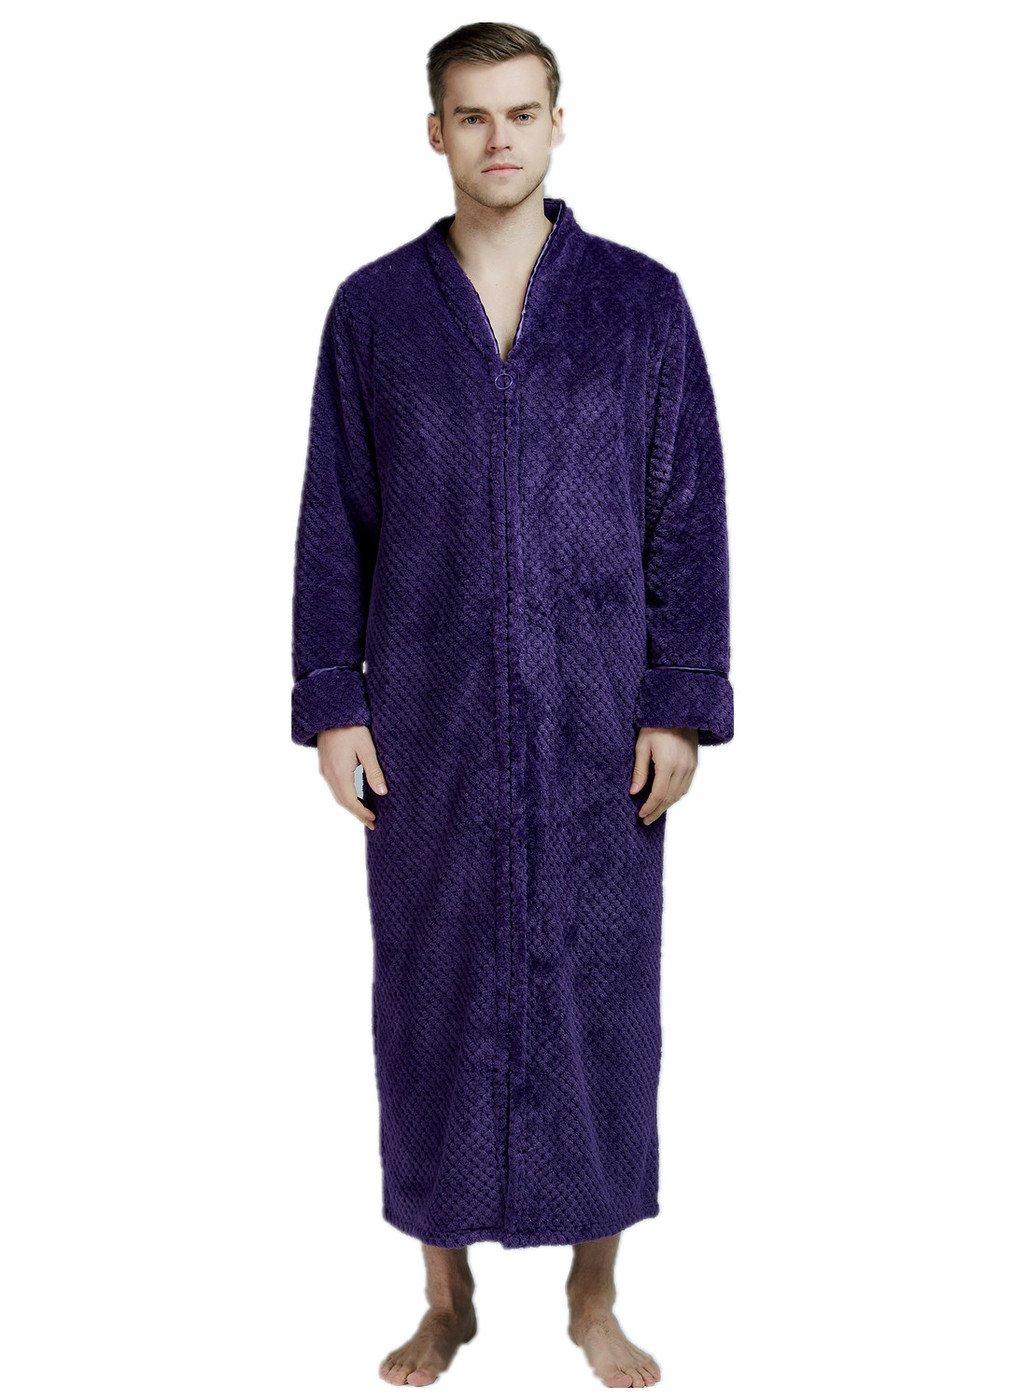 VERNASSA Mens Fleece Robe, Soft Zip-Front Bathrobe Full Length Long Sleeve Sleepwear Spa Bathrobe